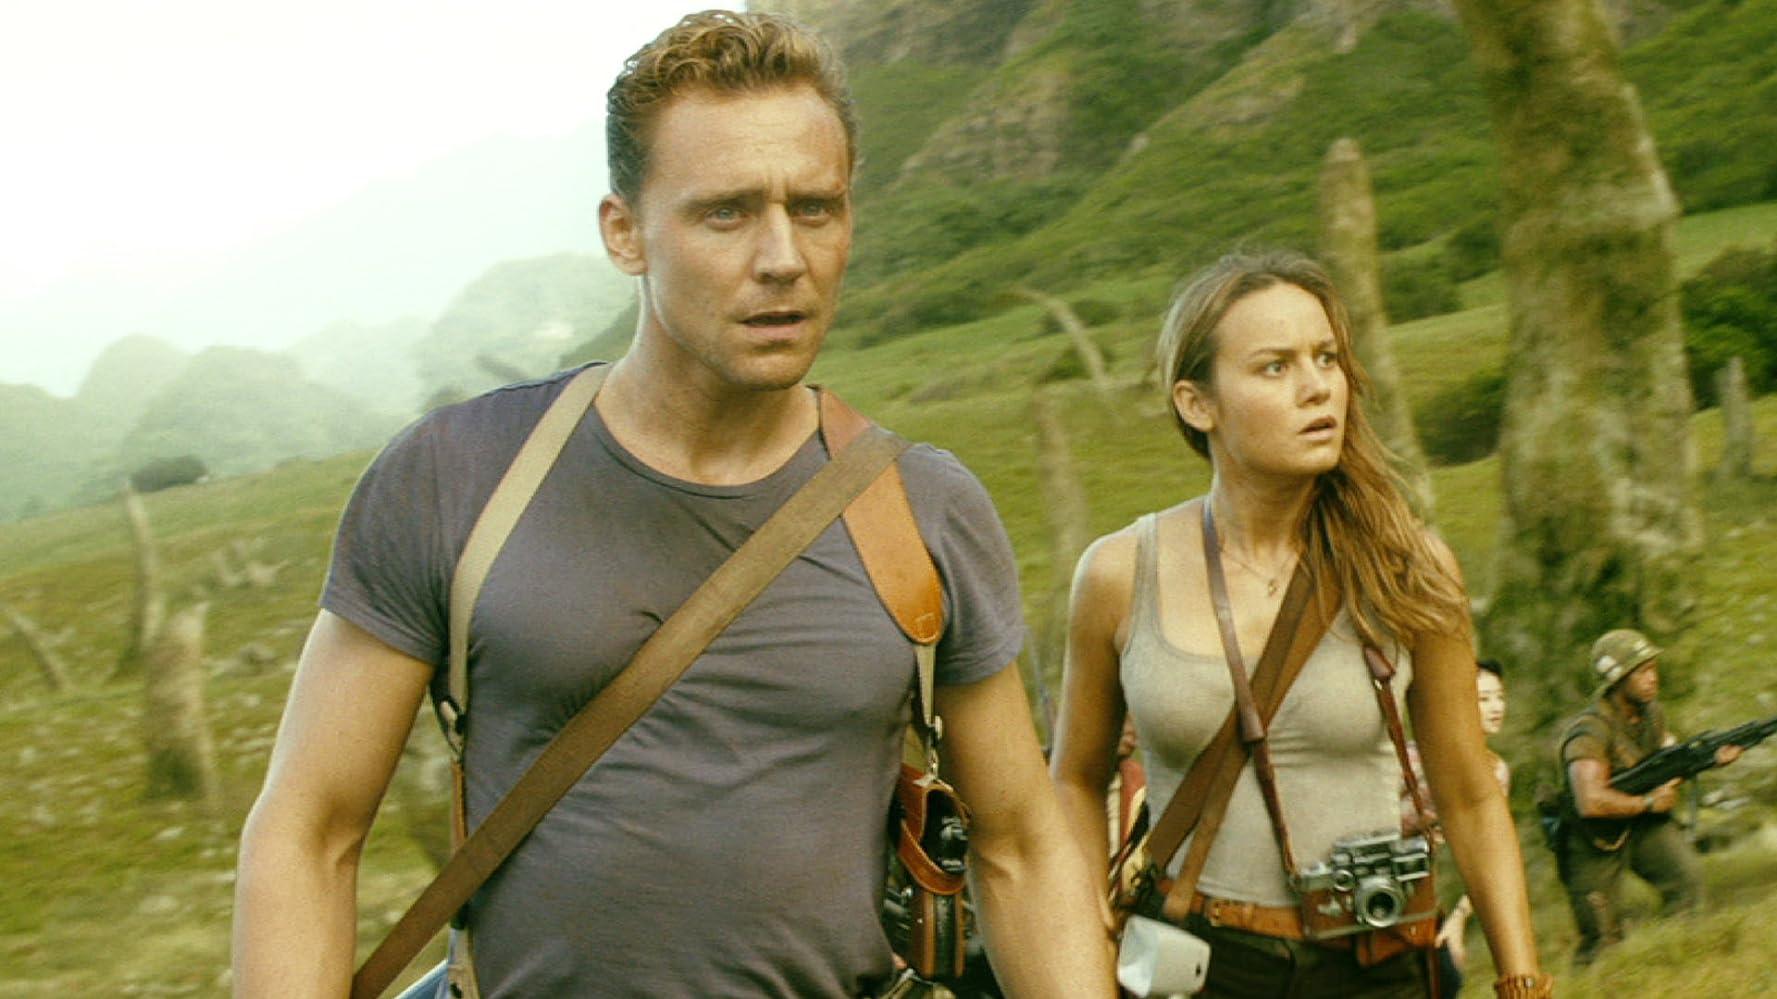 Brie Larson and Tom Hiddleston in Kong: Skull Island (2017)